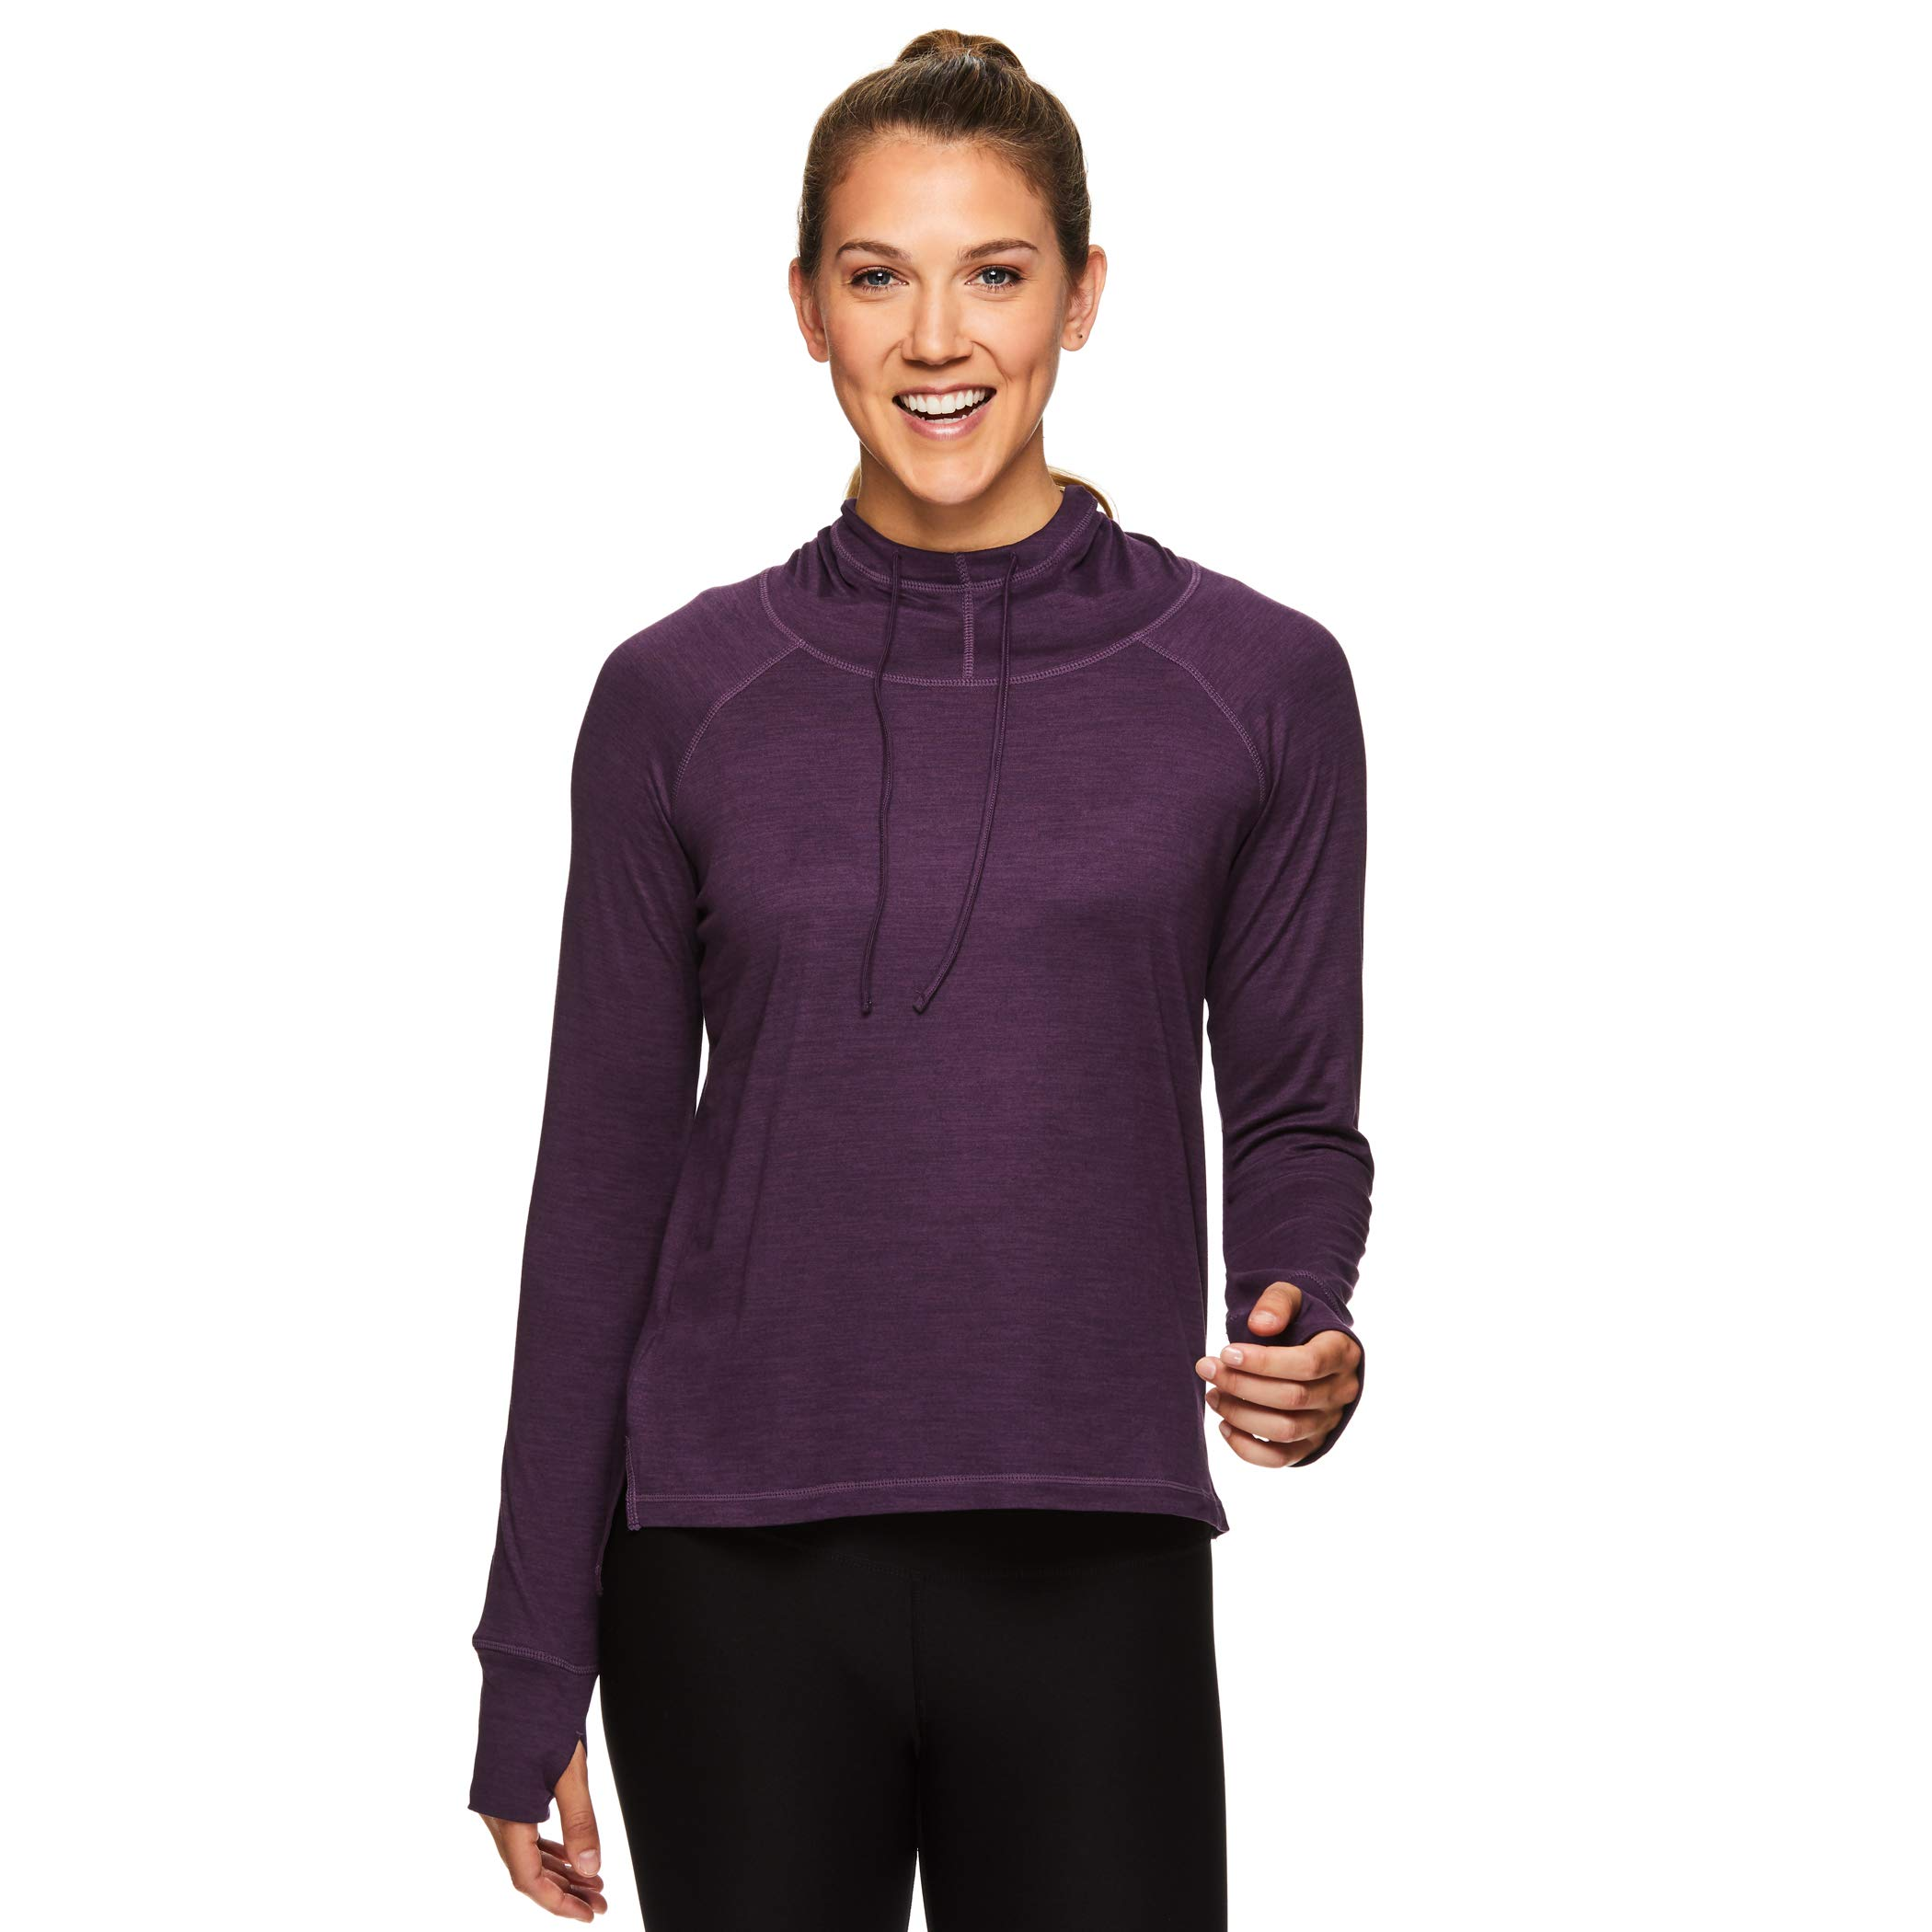 Gaiam Women's Pullover Hoodie Yoga Sweatshirt - Lightweight Long Sleeve Athleisure Sweater - Maya Navy Blue Cosmos Heather, Medium by Gaiam